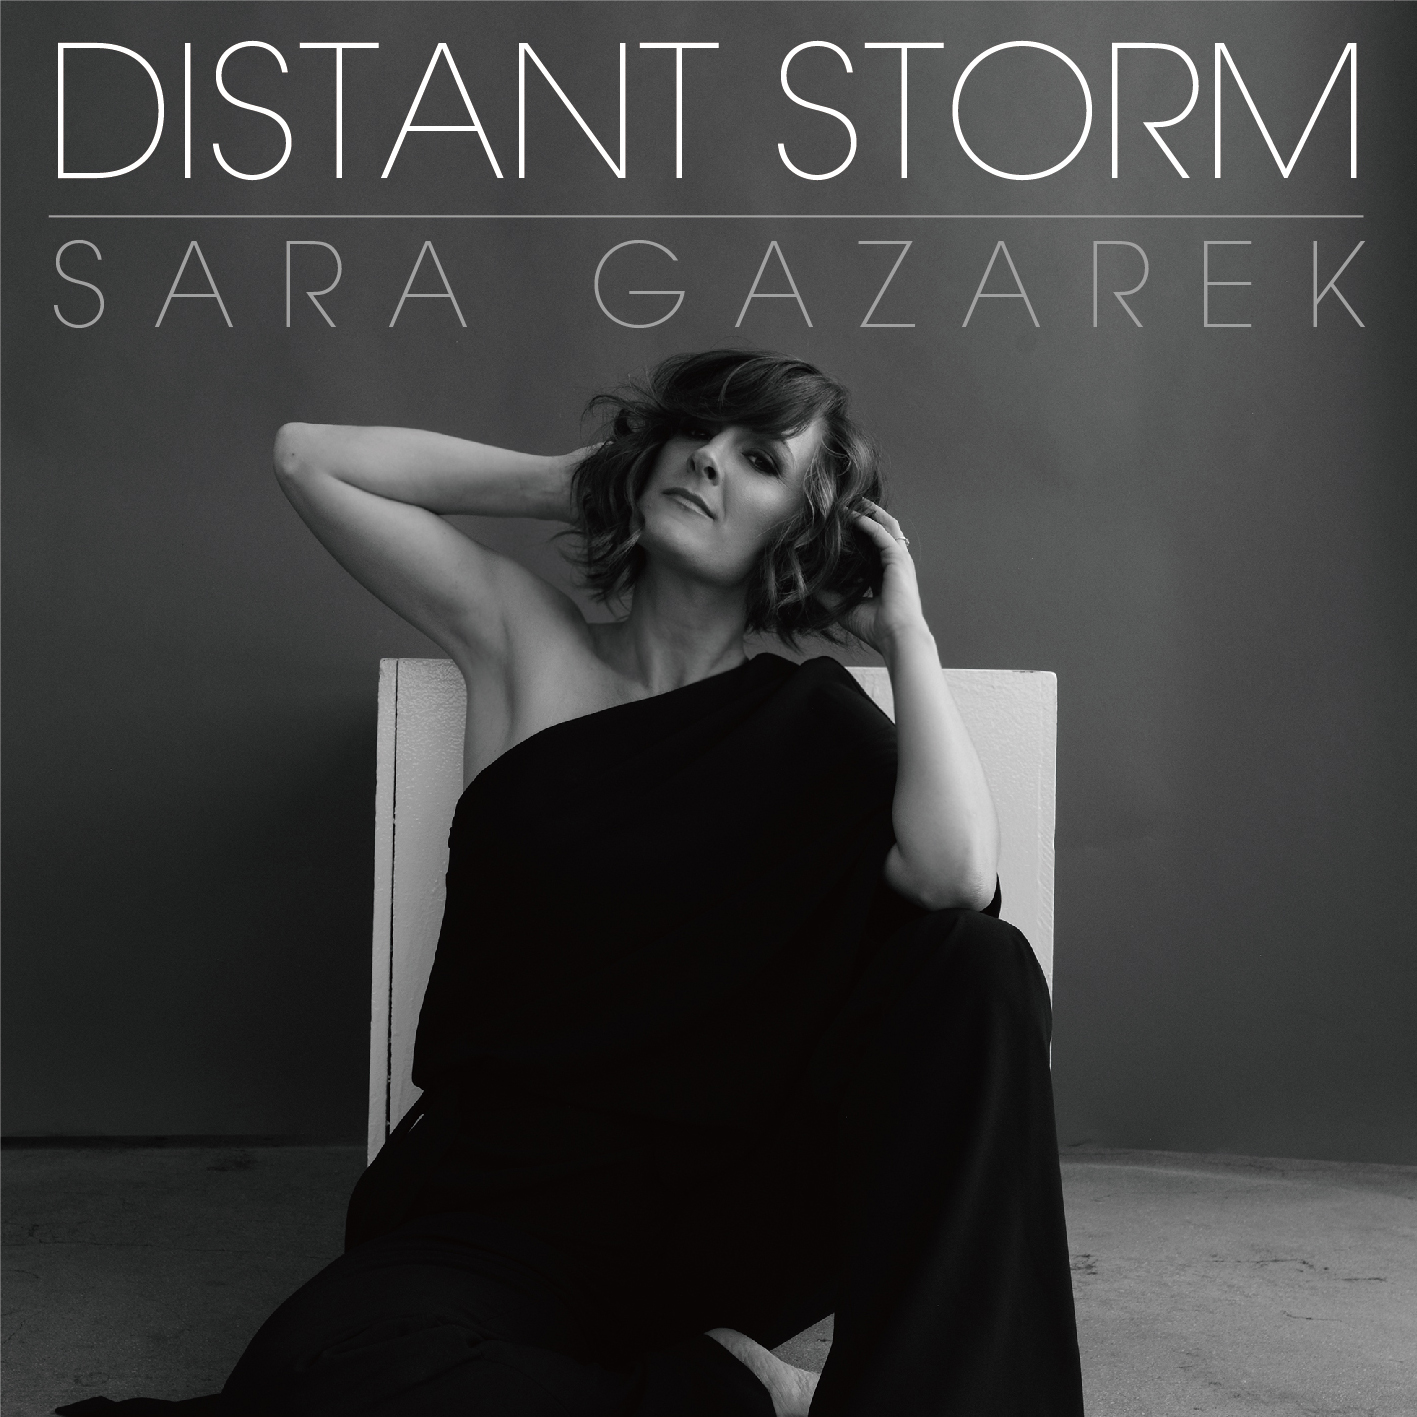 SARA GAZAREK - Distant Storm cover